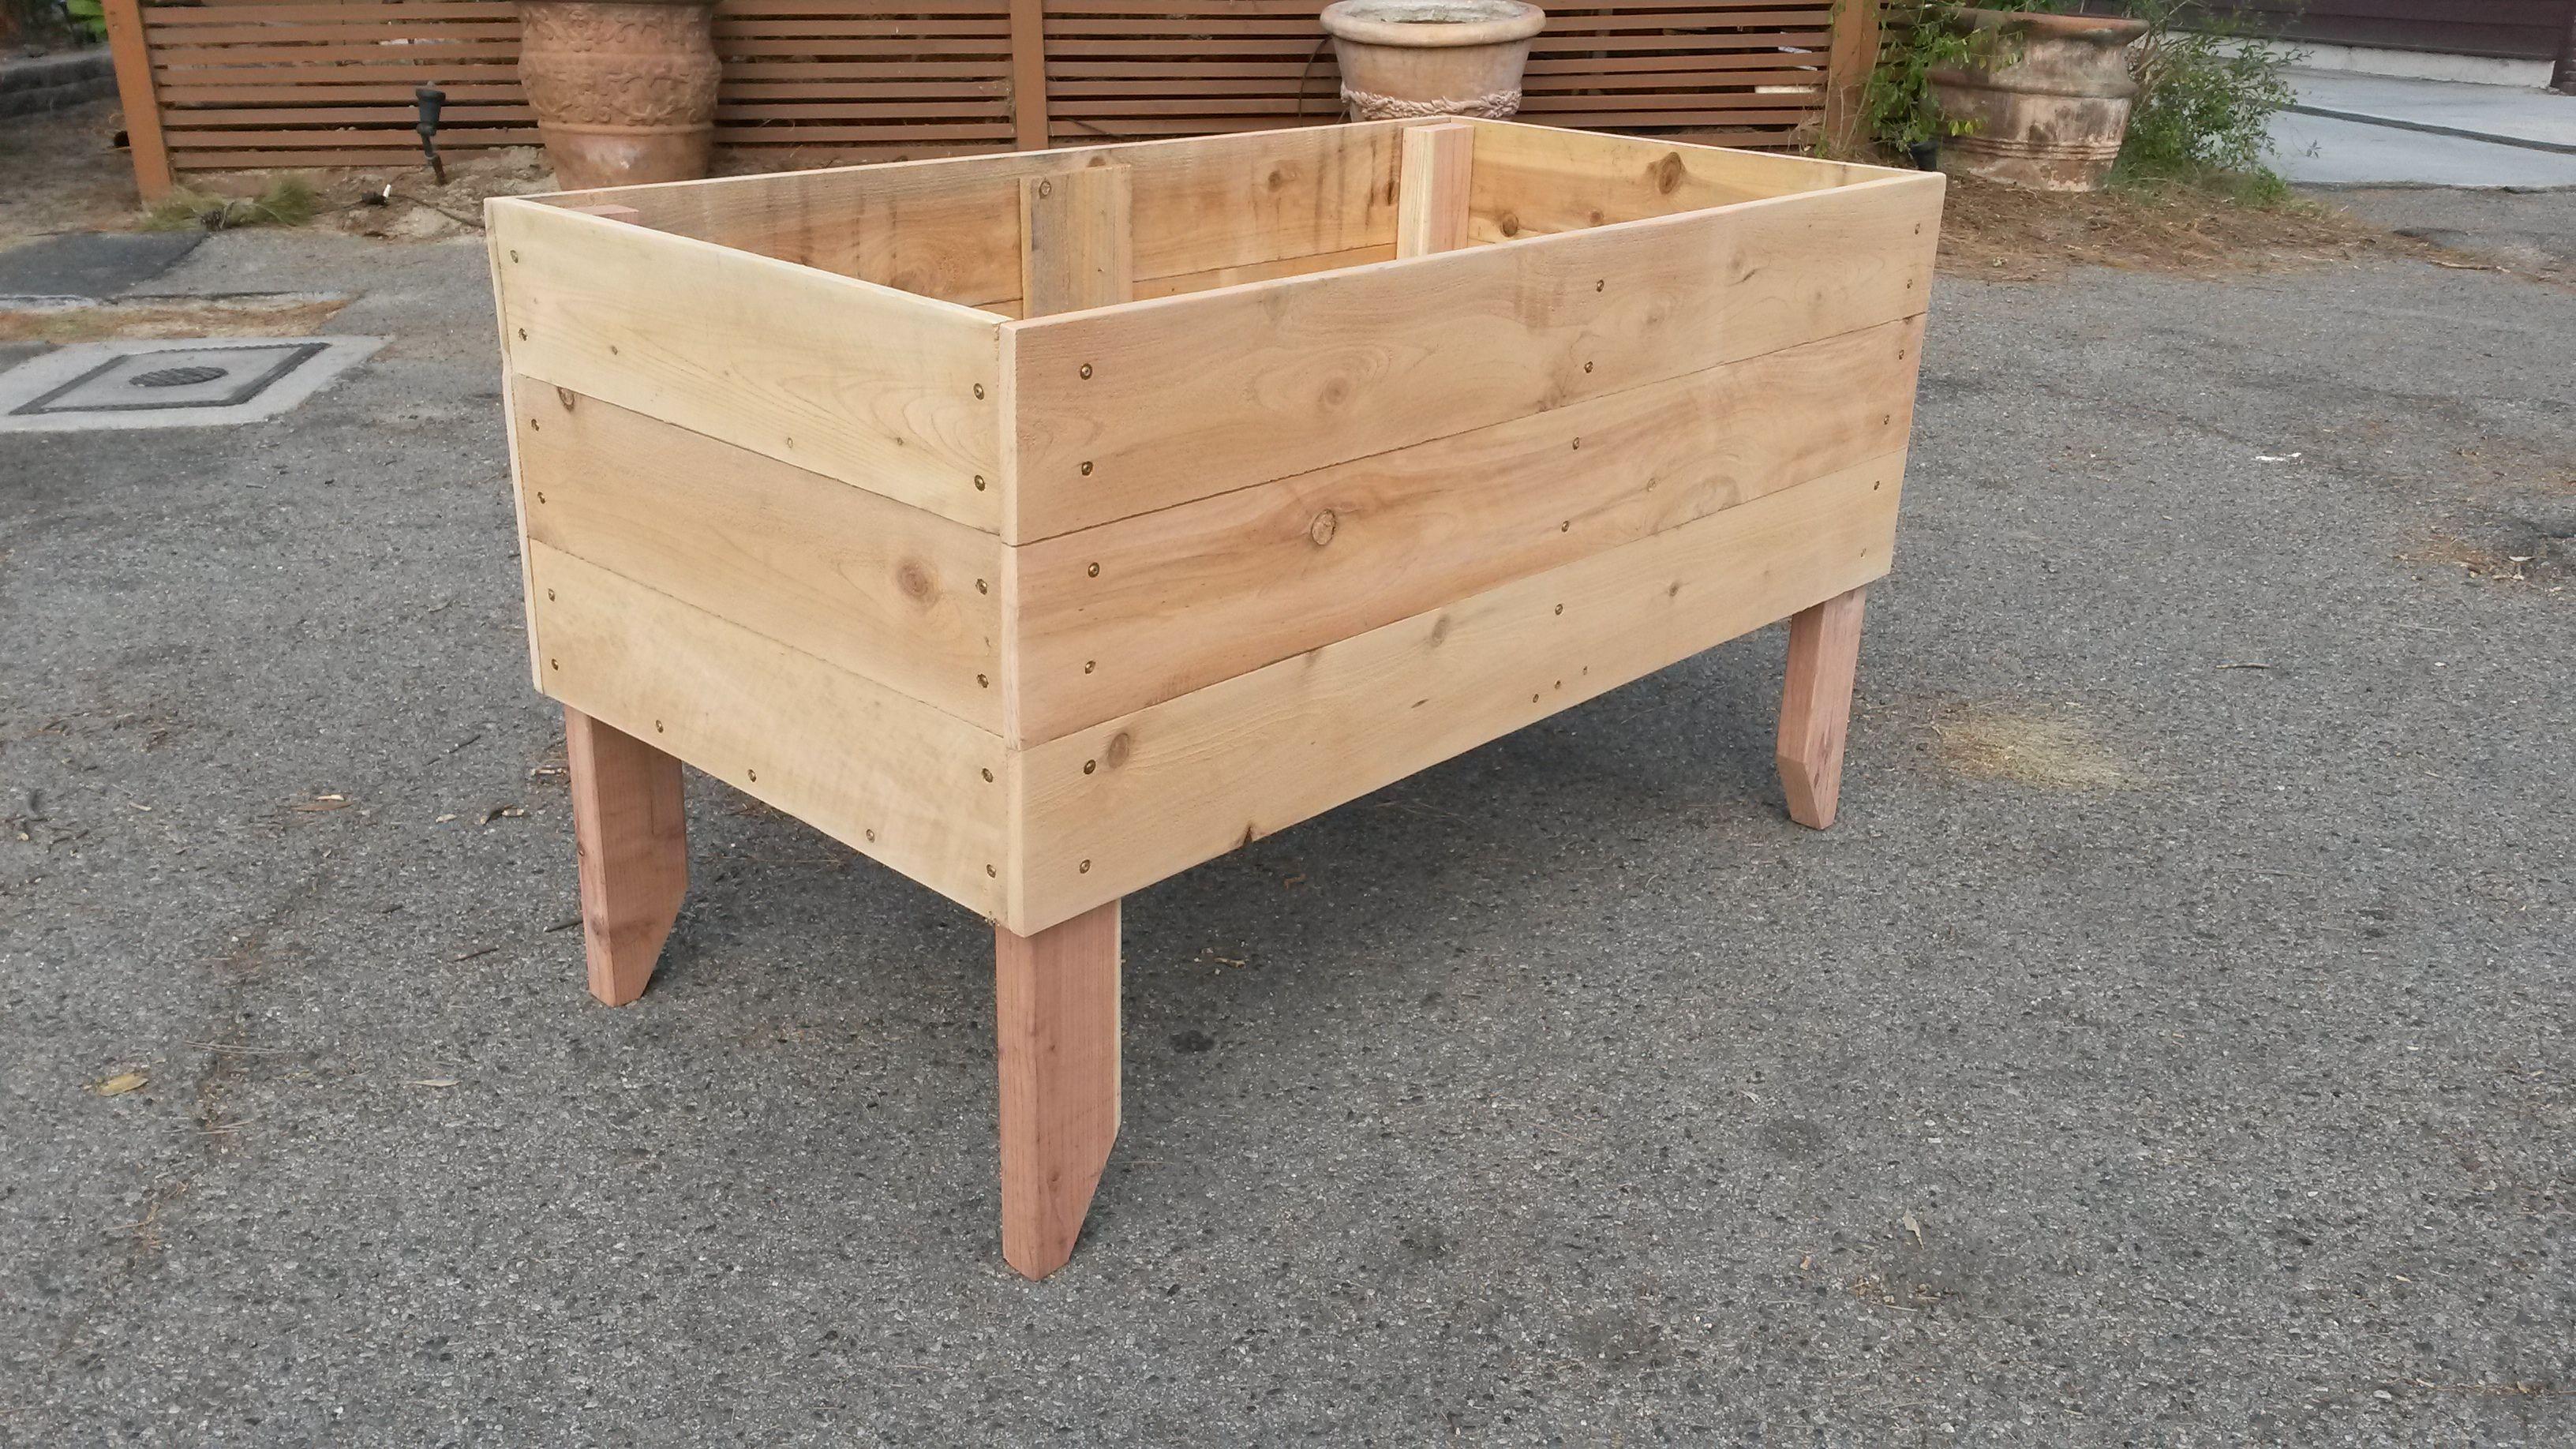 2u0027 X 4u0027 Planter Box On Legs Designed And Built By TheUrbanFarmer.biz